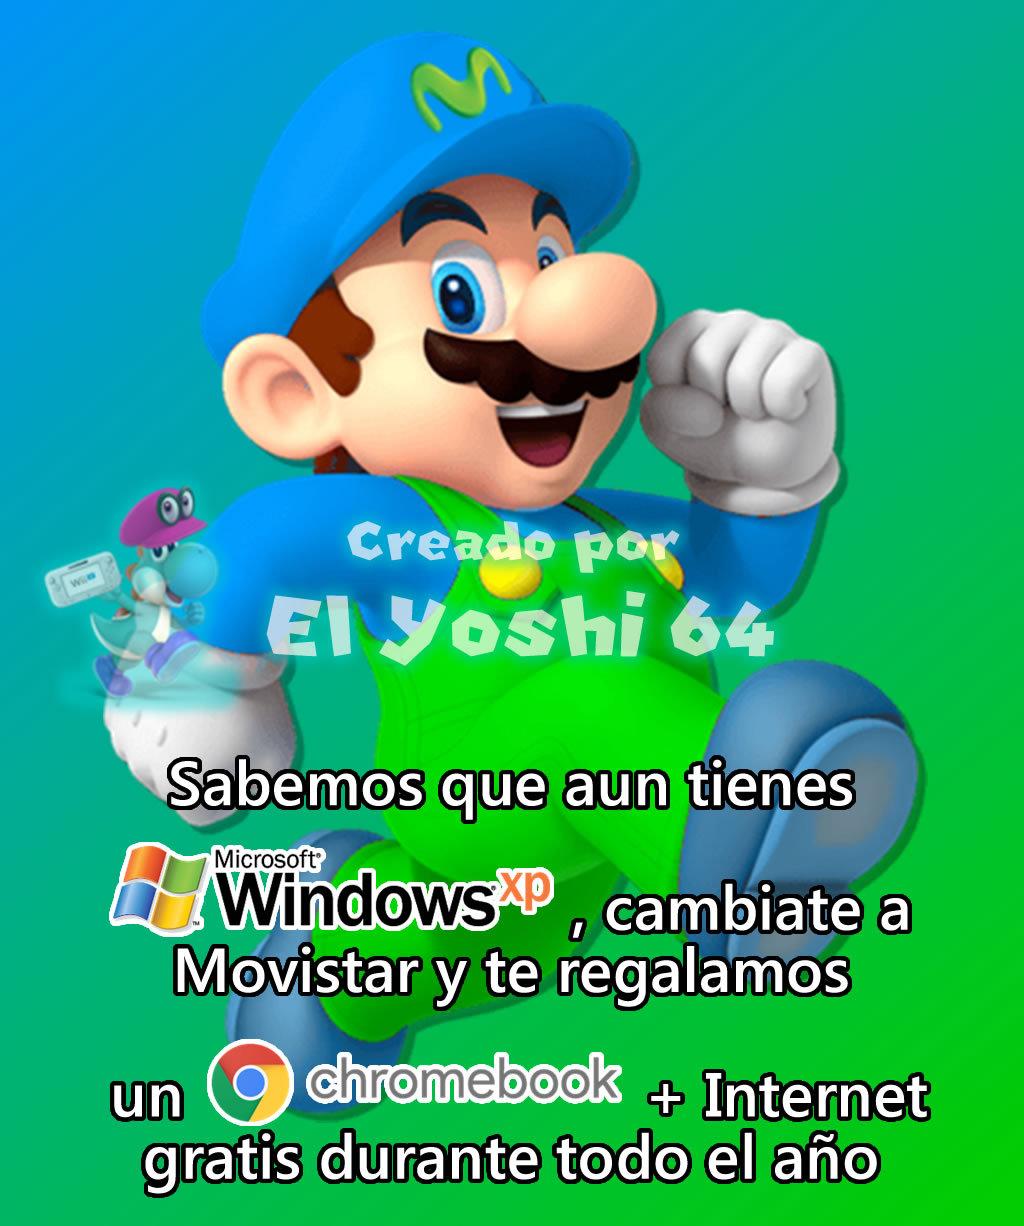 ahora Movistar tambien te ofrece un Chromebook si aun tienes Windows XP, ajajjajajajajajaj - PD: Yo aun tengo Windows 7 - meme